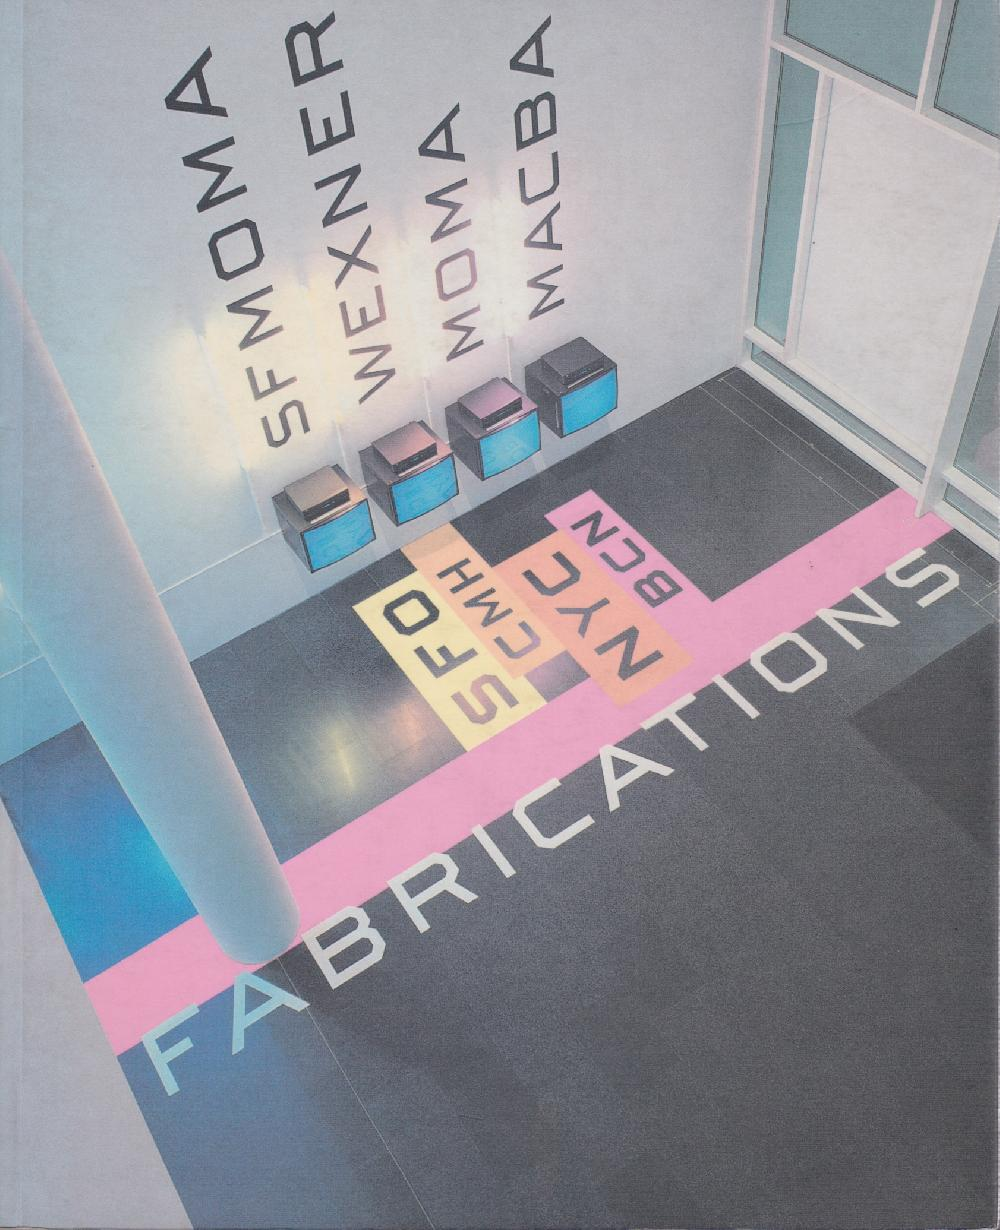 Fabrications / Fabricaciones